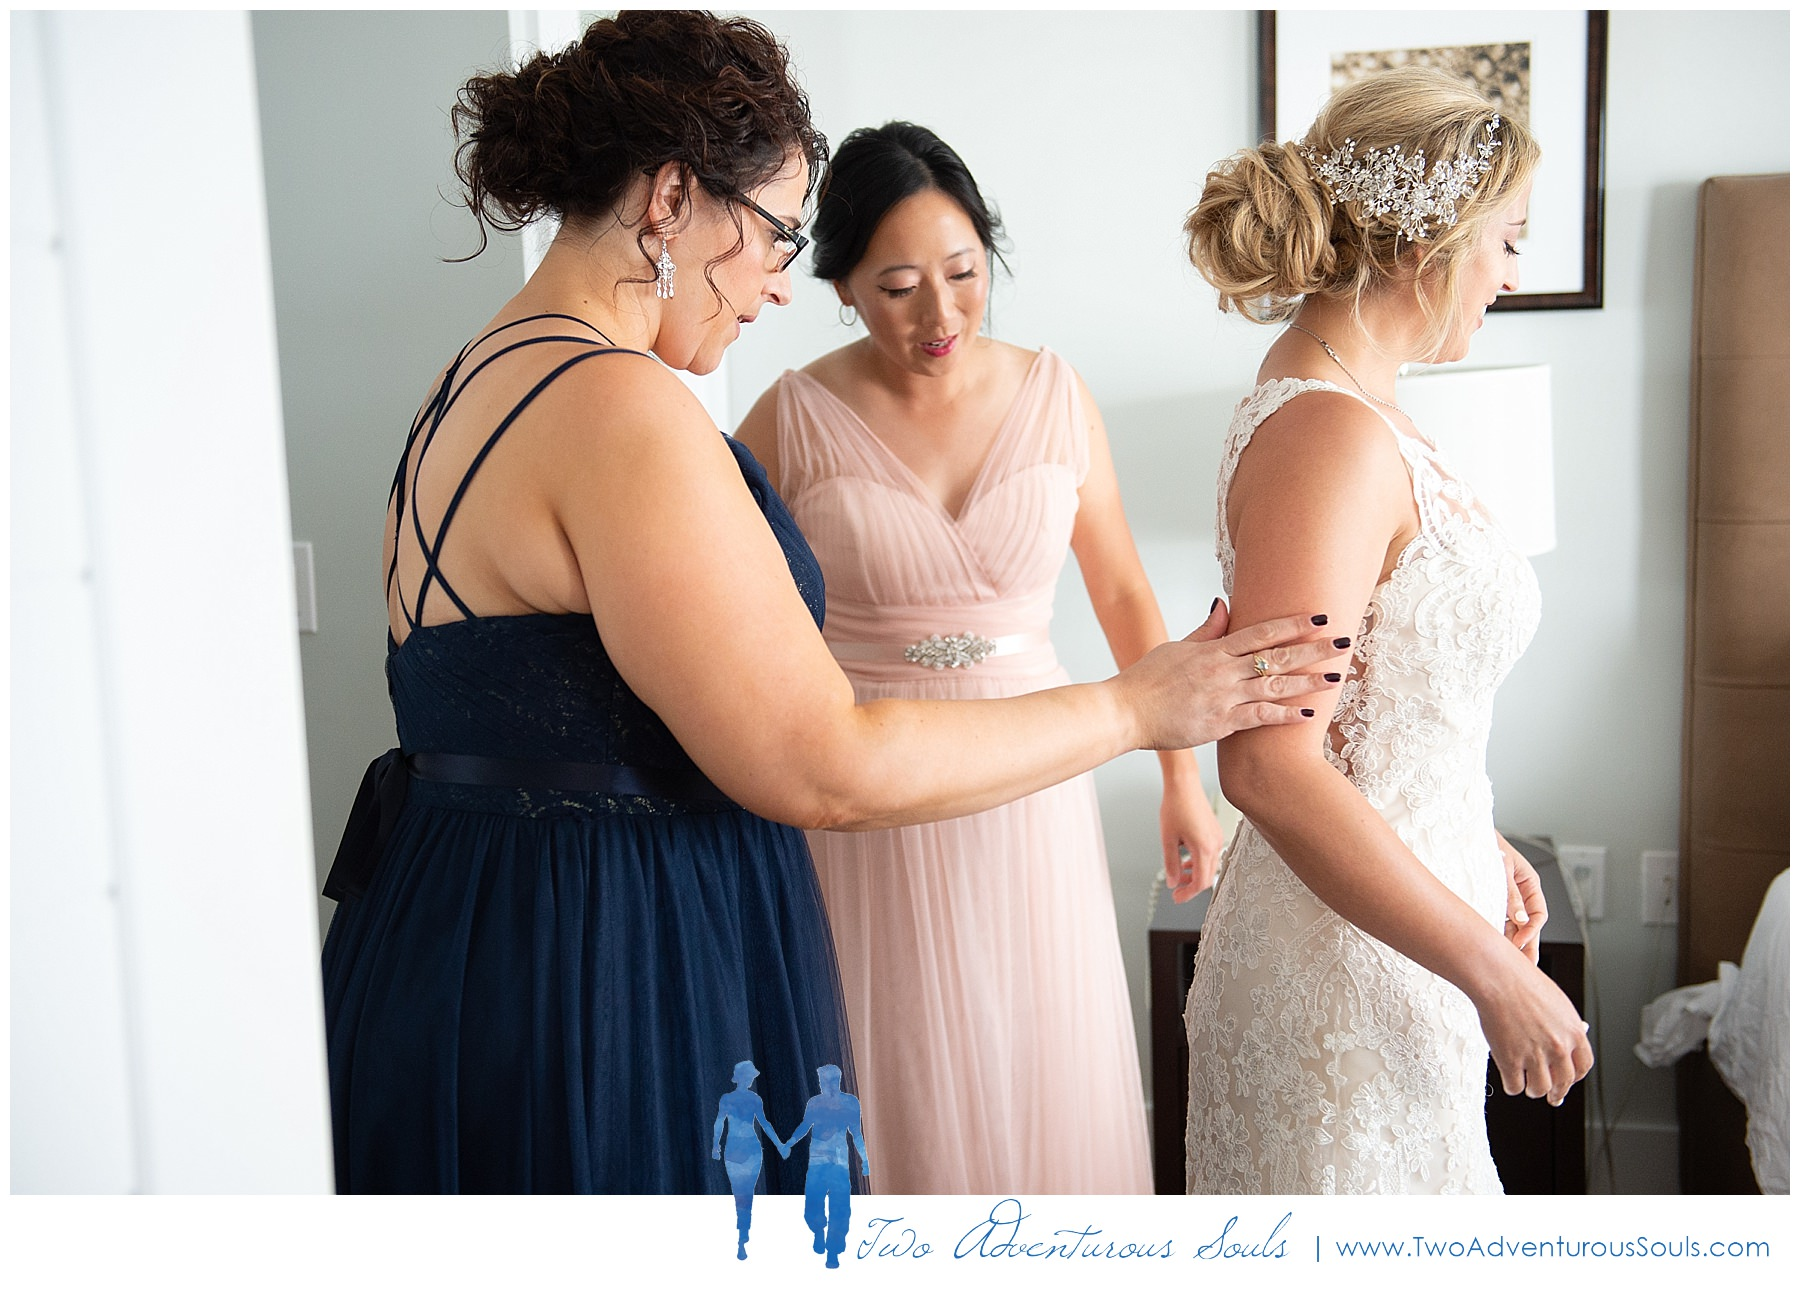 Connecticut Wedding Photographers, Lace Factory Wedding Photographers, Two Adventurous Souls - 083119_0018.jpg